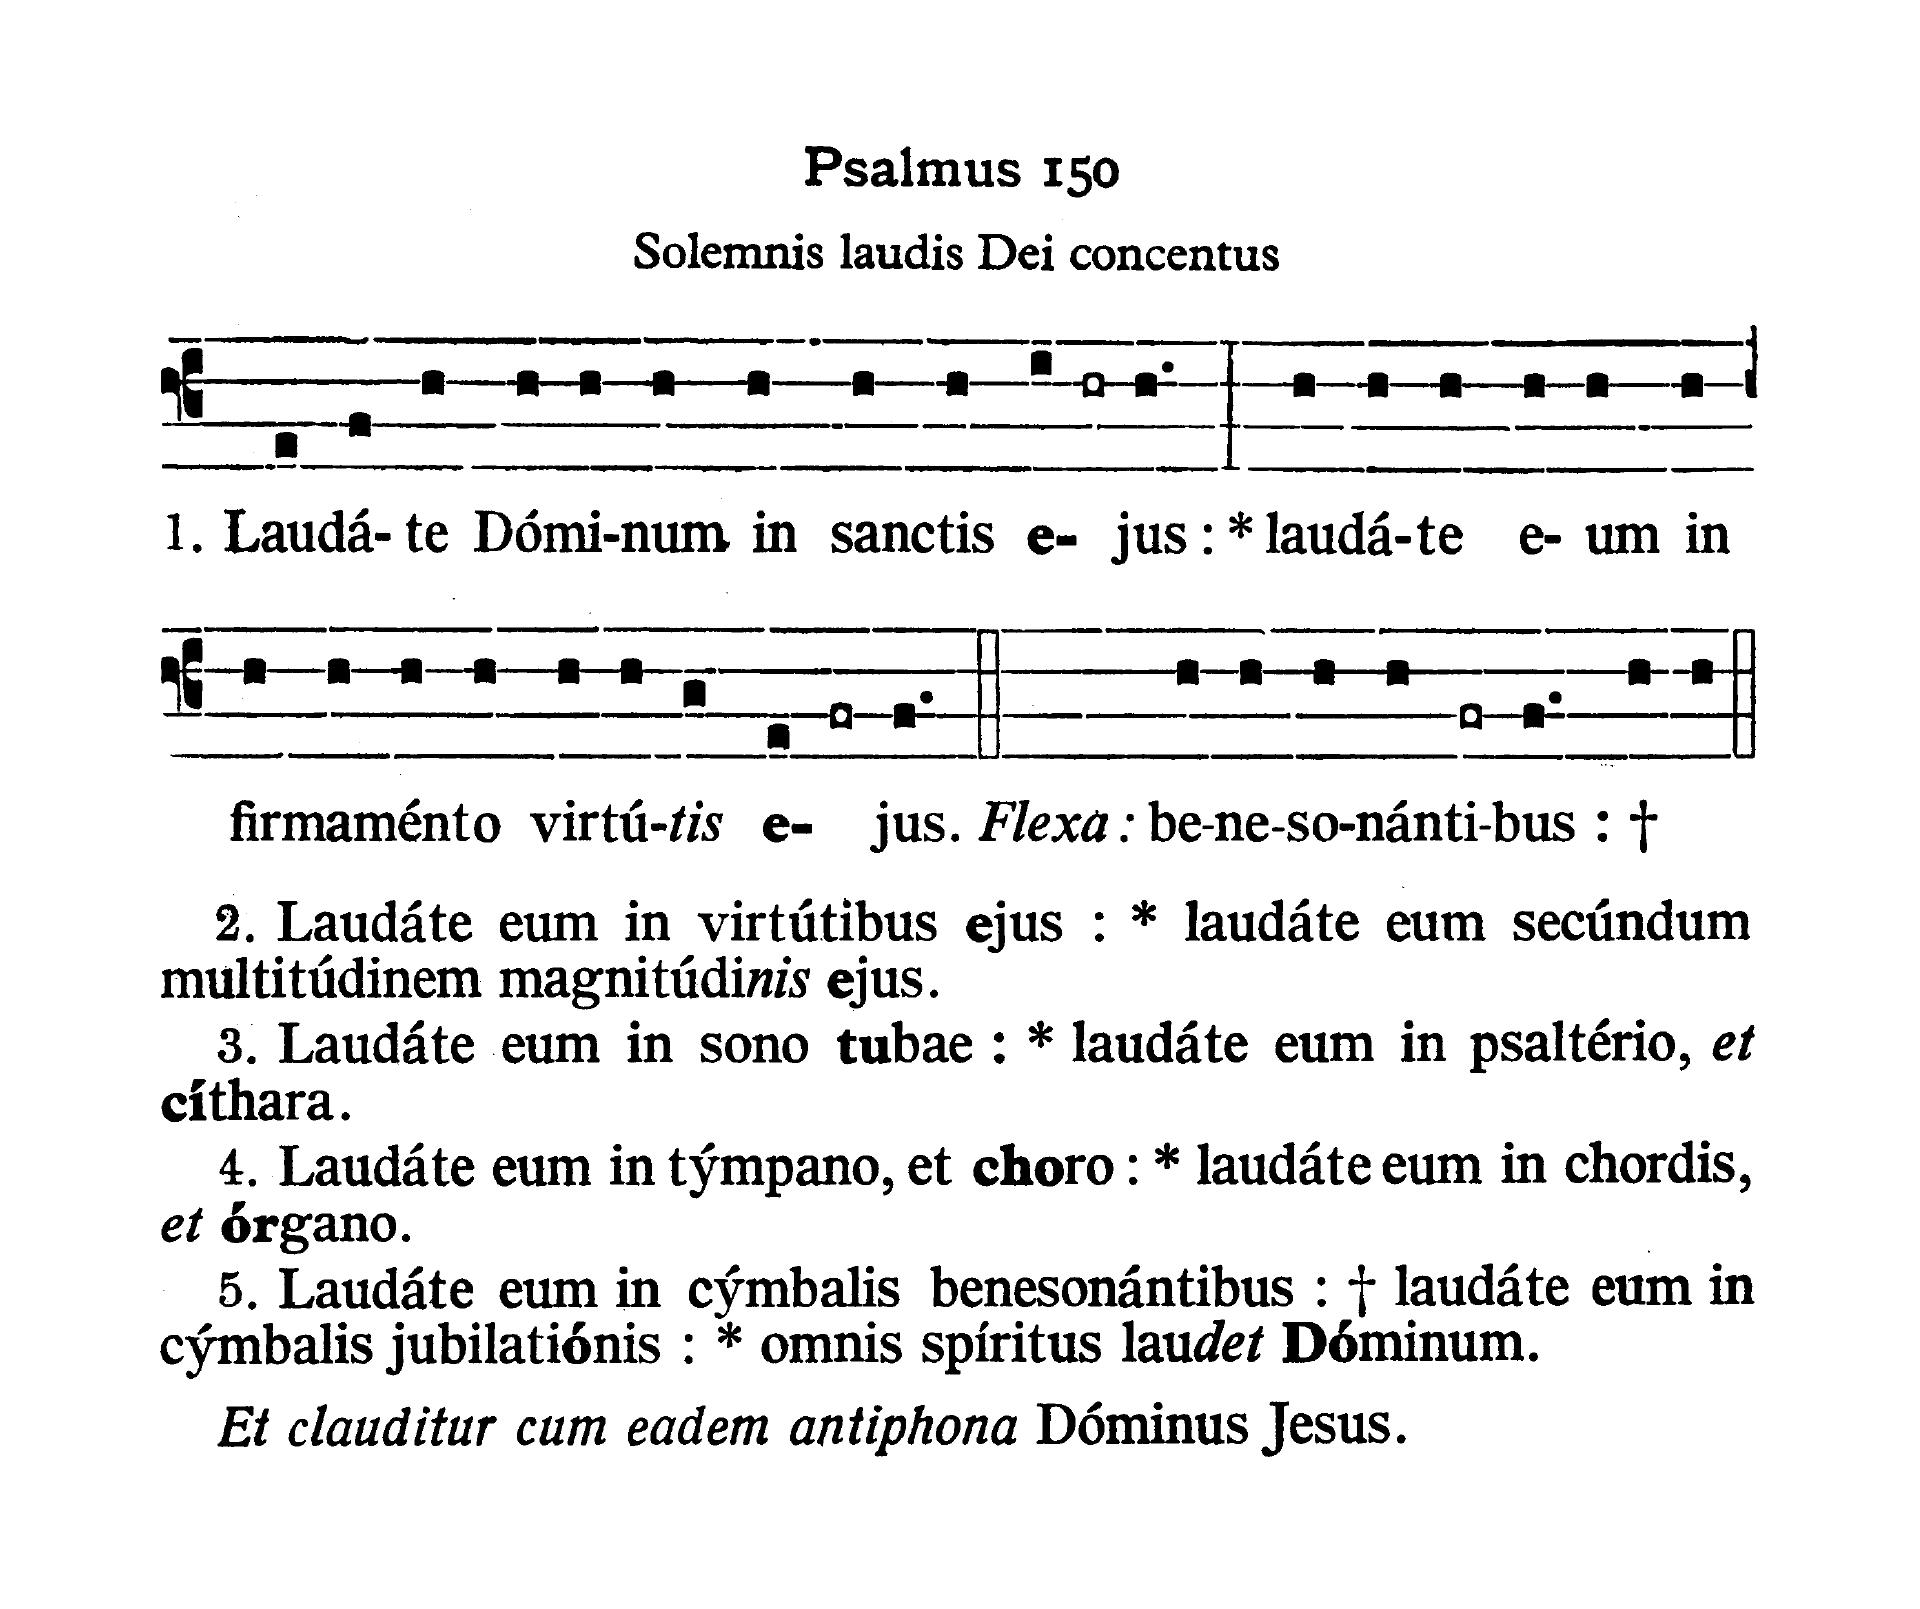 Feria V in Cena Domini (Holy Thursday) - Psalmus (Laudate Dominum)